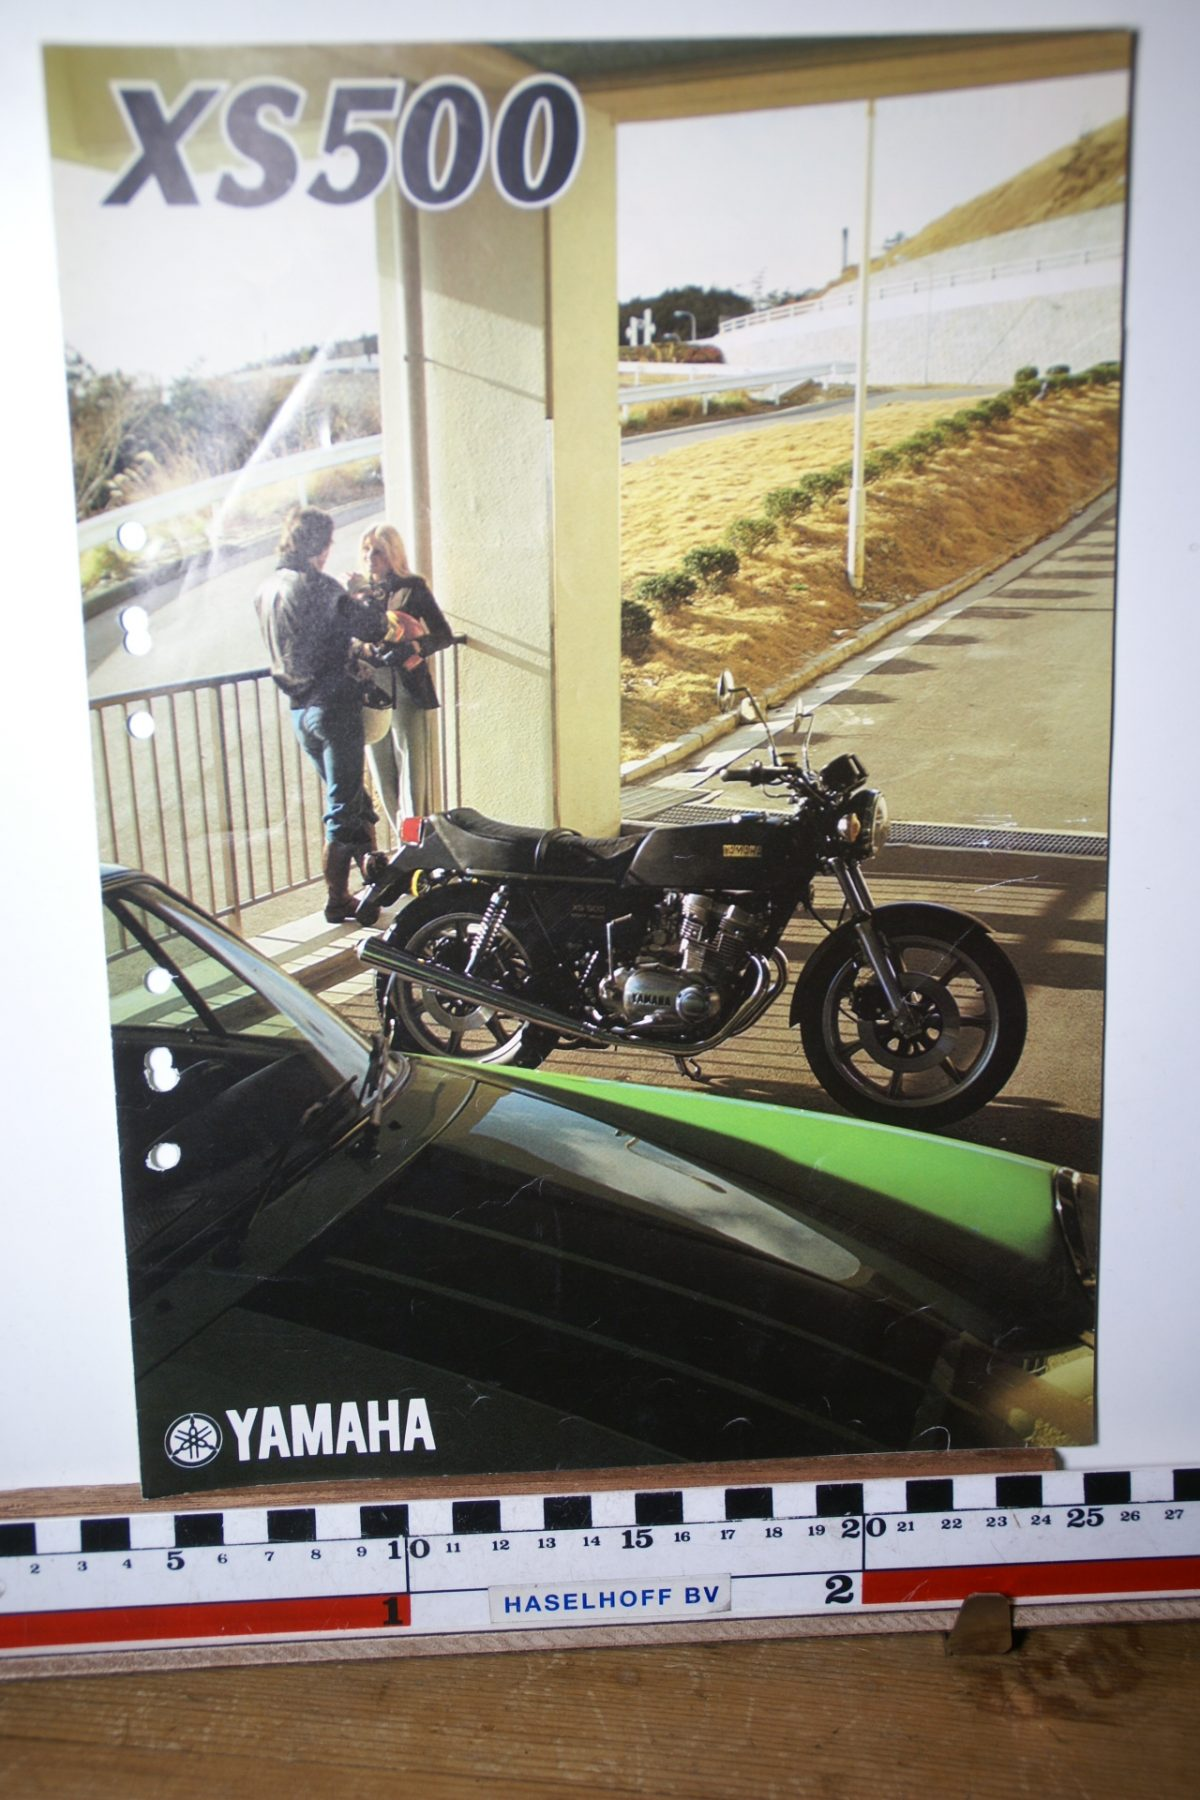 DSC02644 ca 1977 brochure Yamaha XS500 032053